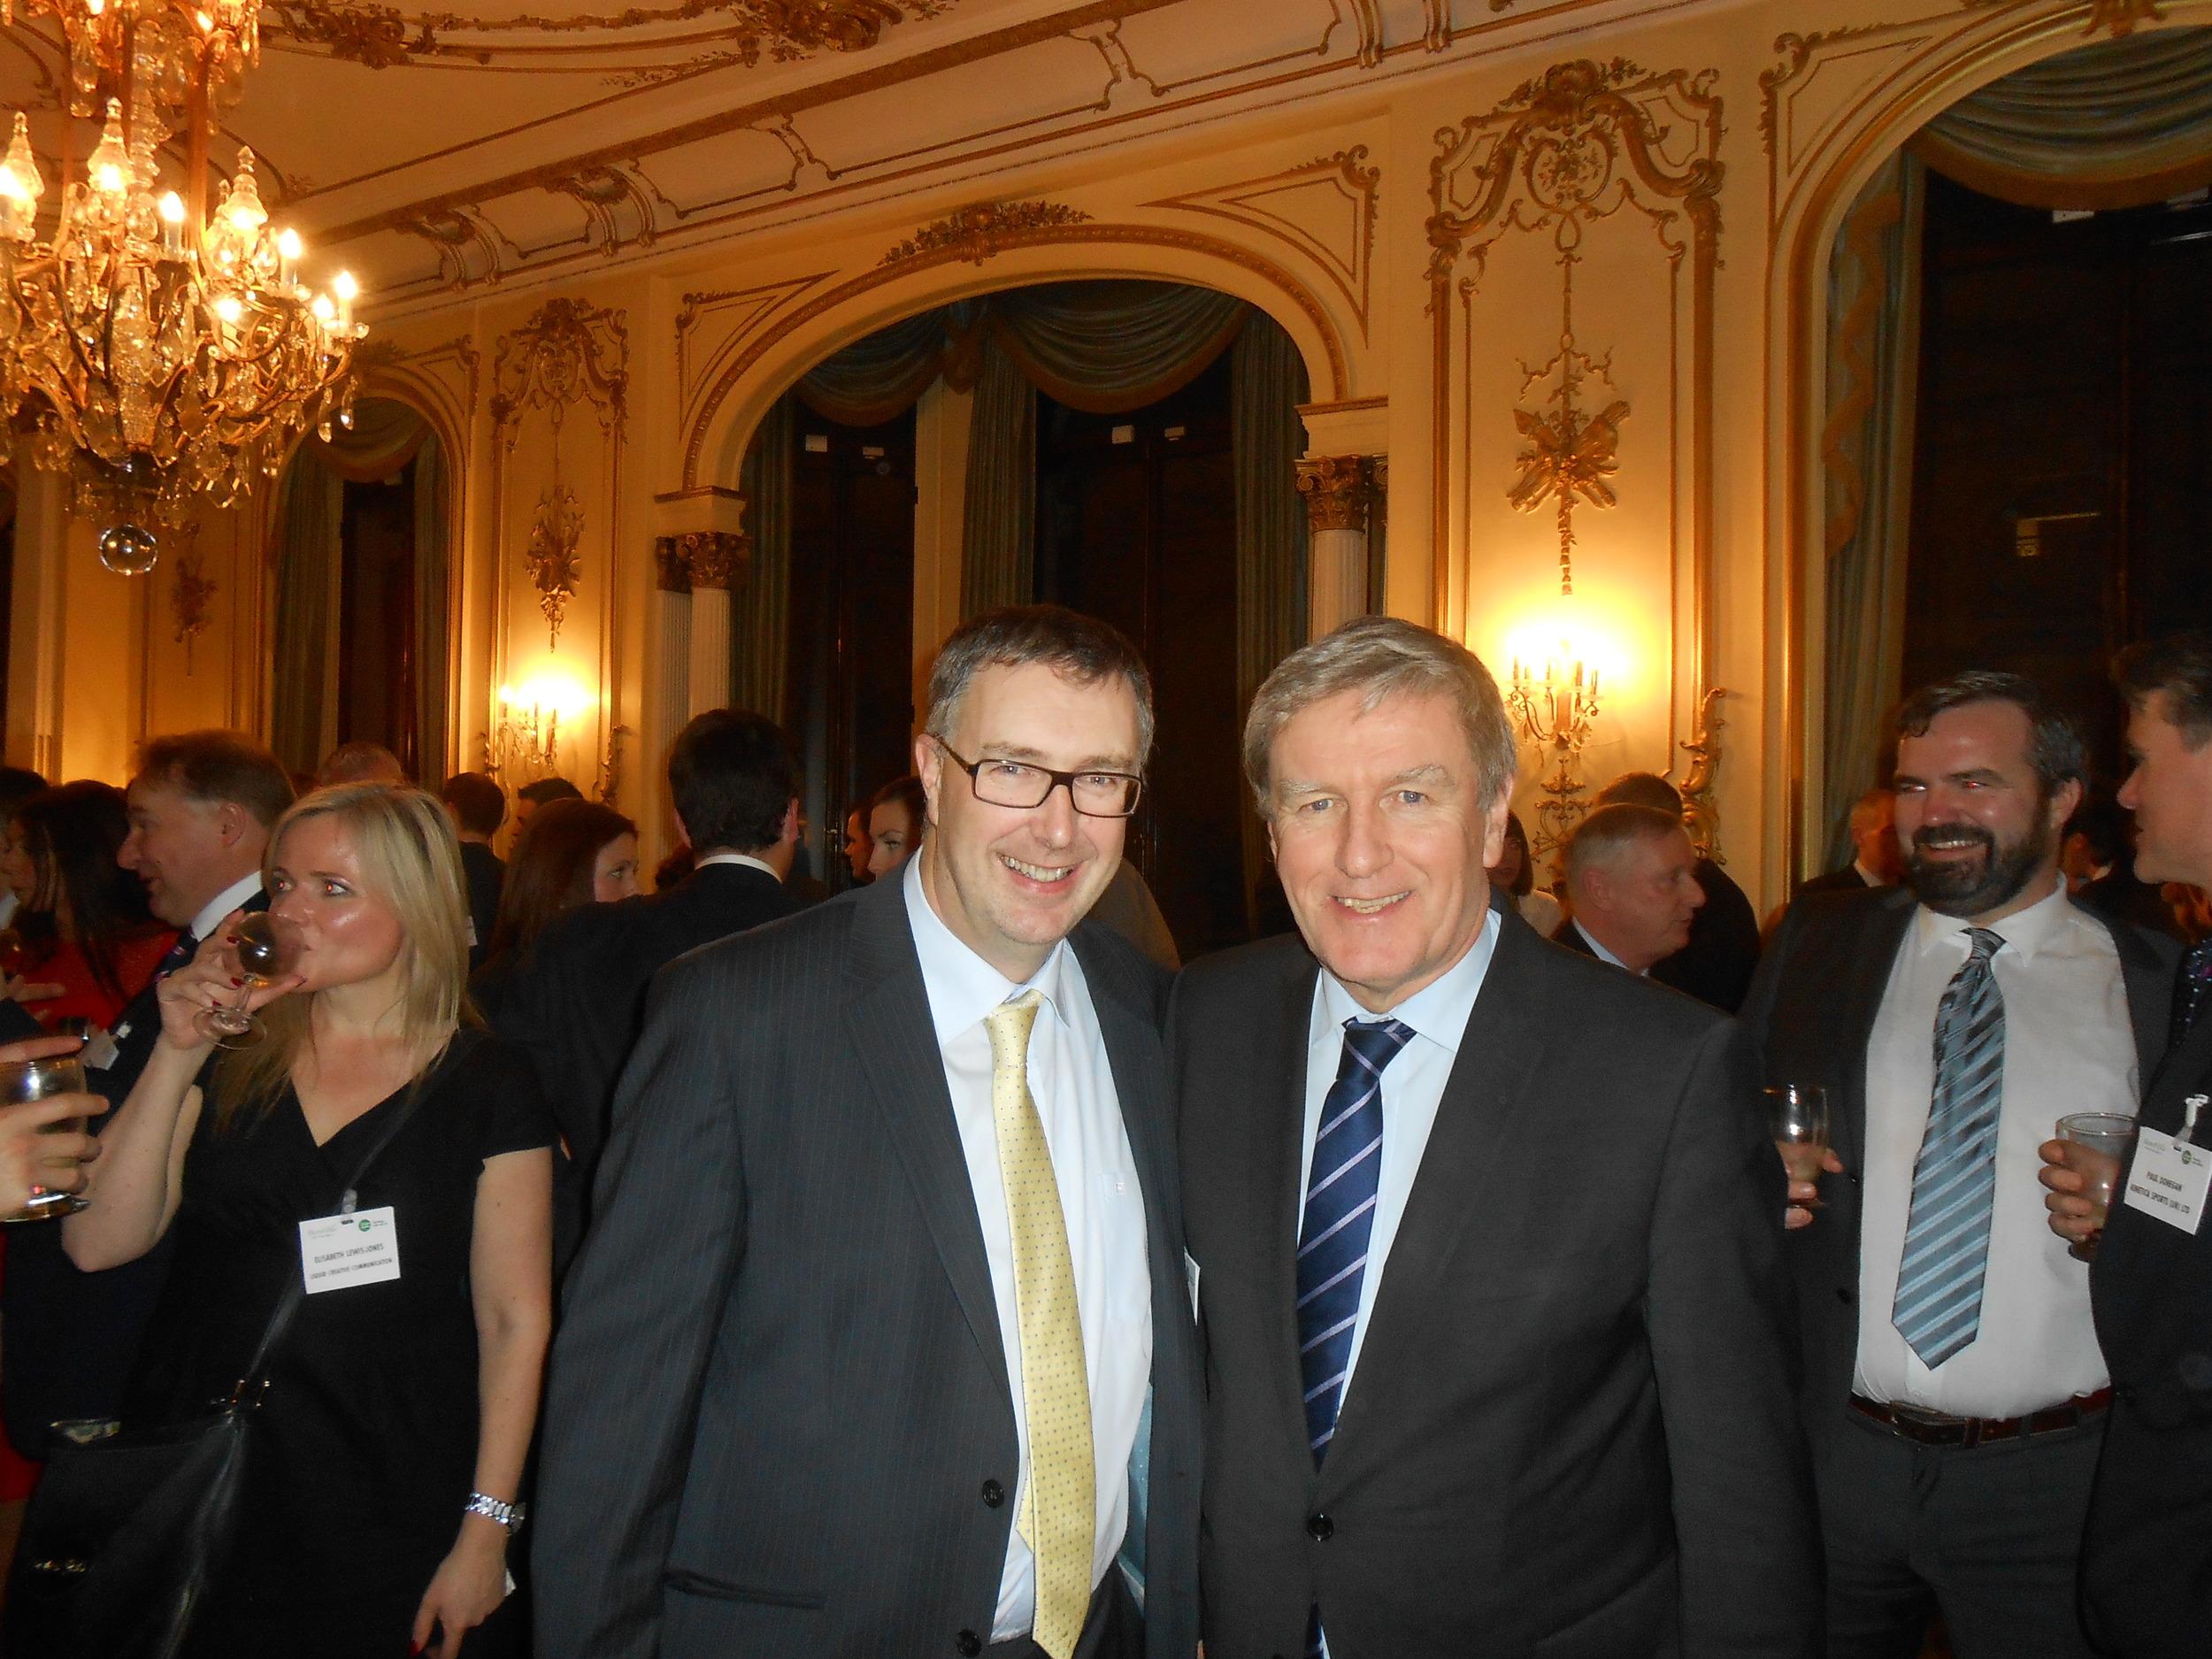 William Deevy, CEO Natures Oils & Sauces withDaniel Mulhall,Ireland's Ambassador to Britain.